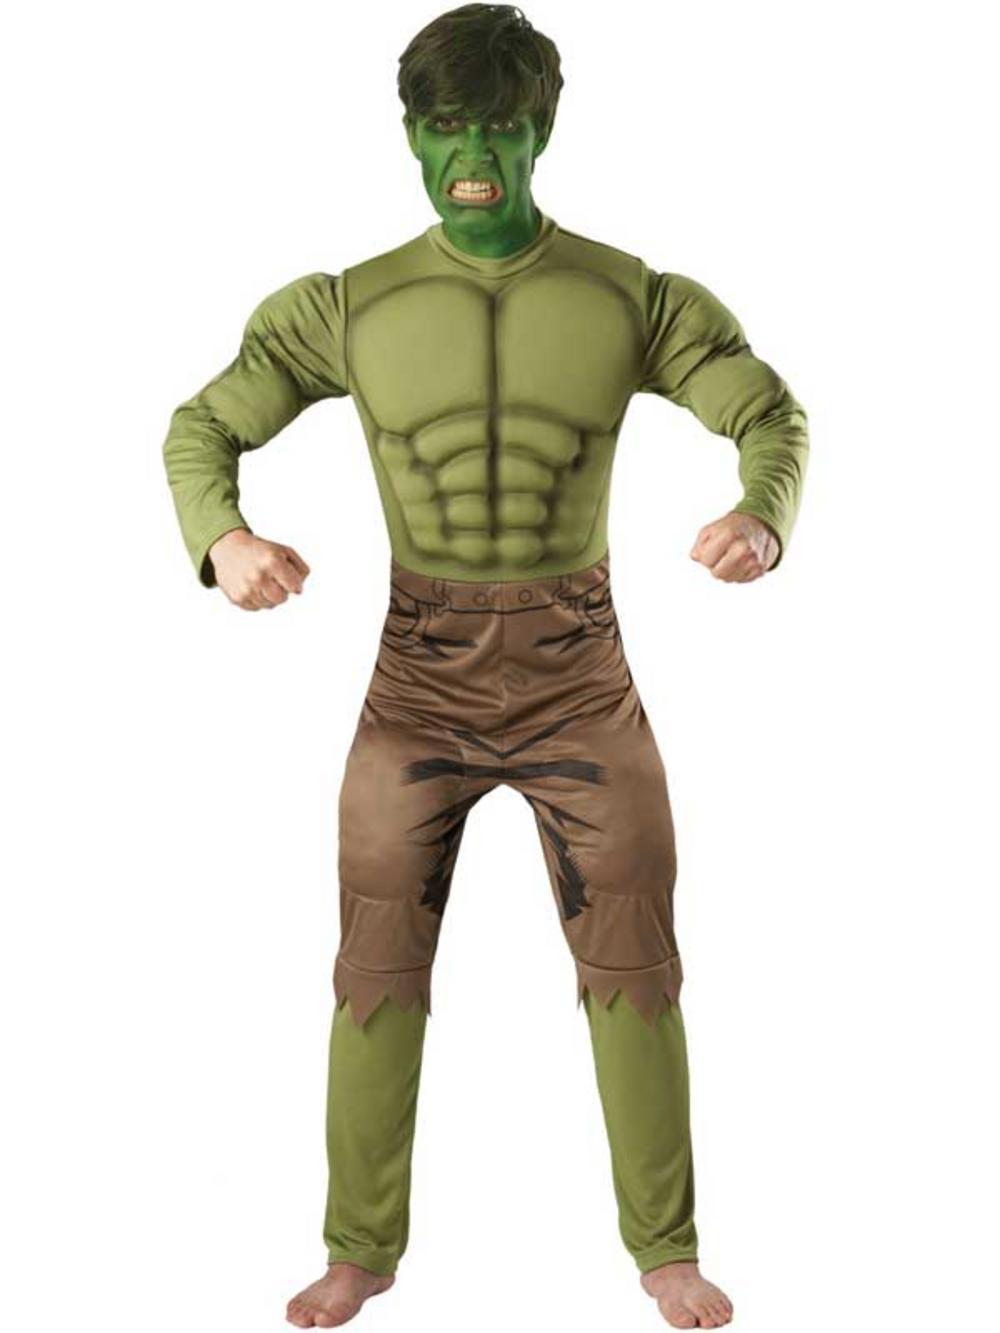 The Incredible Hulk Mens Fancy Dress Avengers Superhero